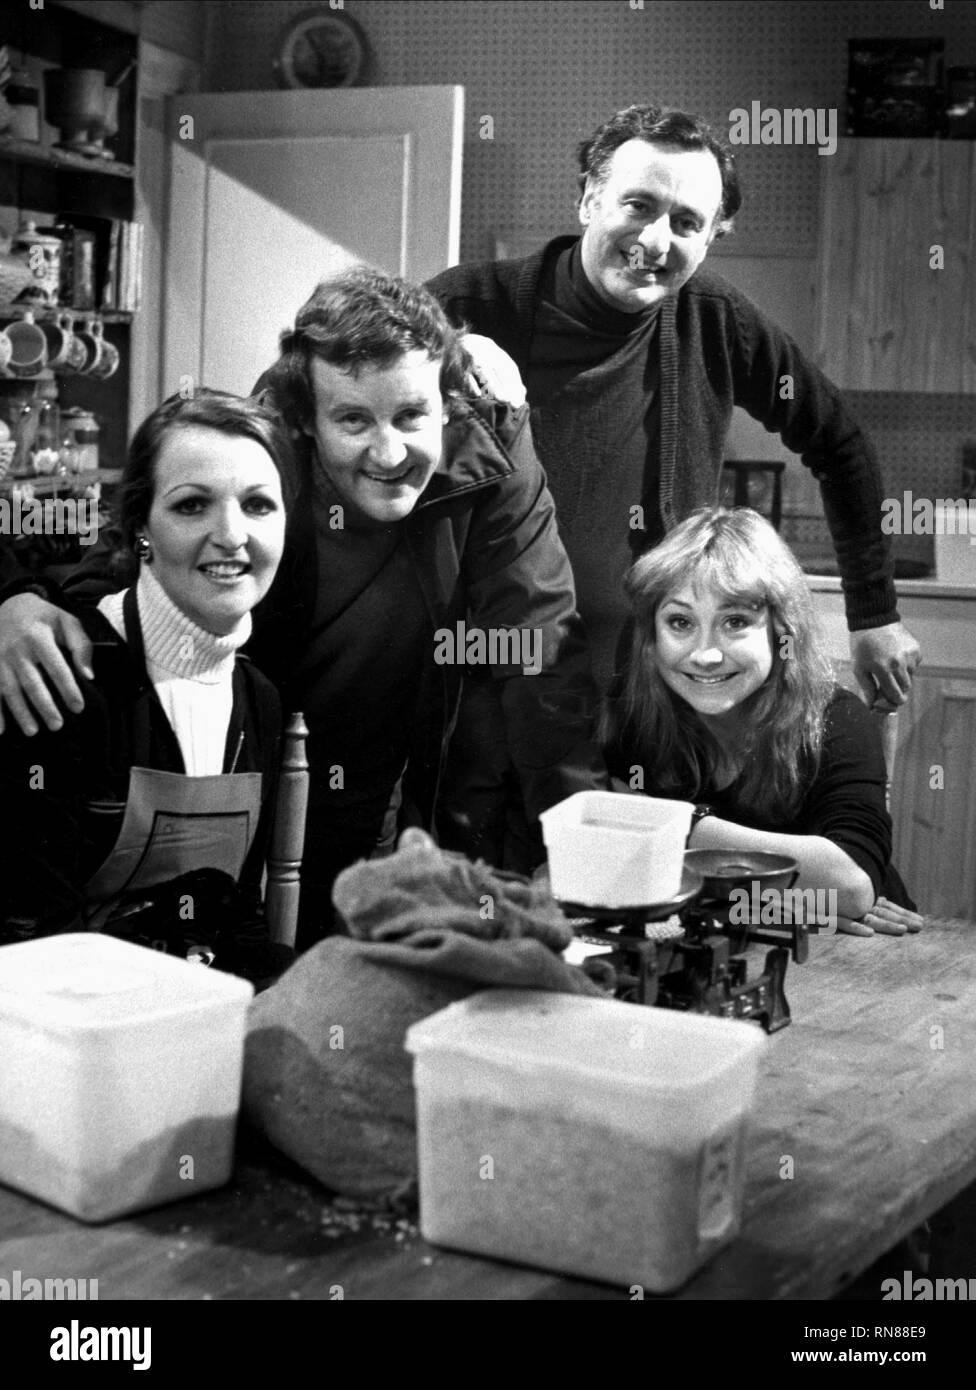 KEITH,BRIERS,KENDAL,EDDINGTON, THE GOOD LIFE, 1975 - Stock Image